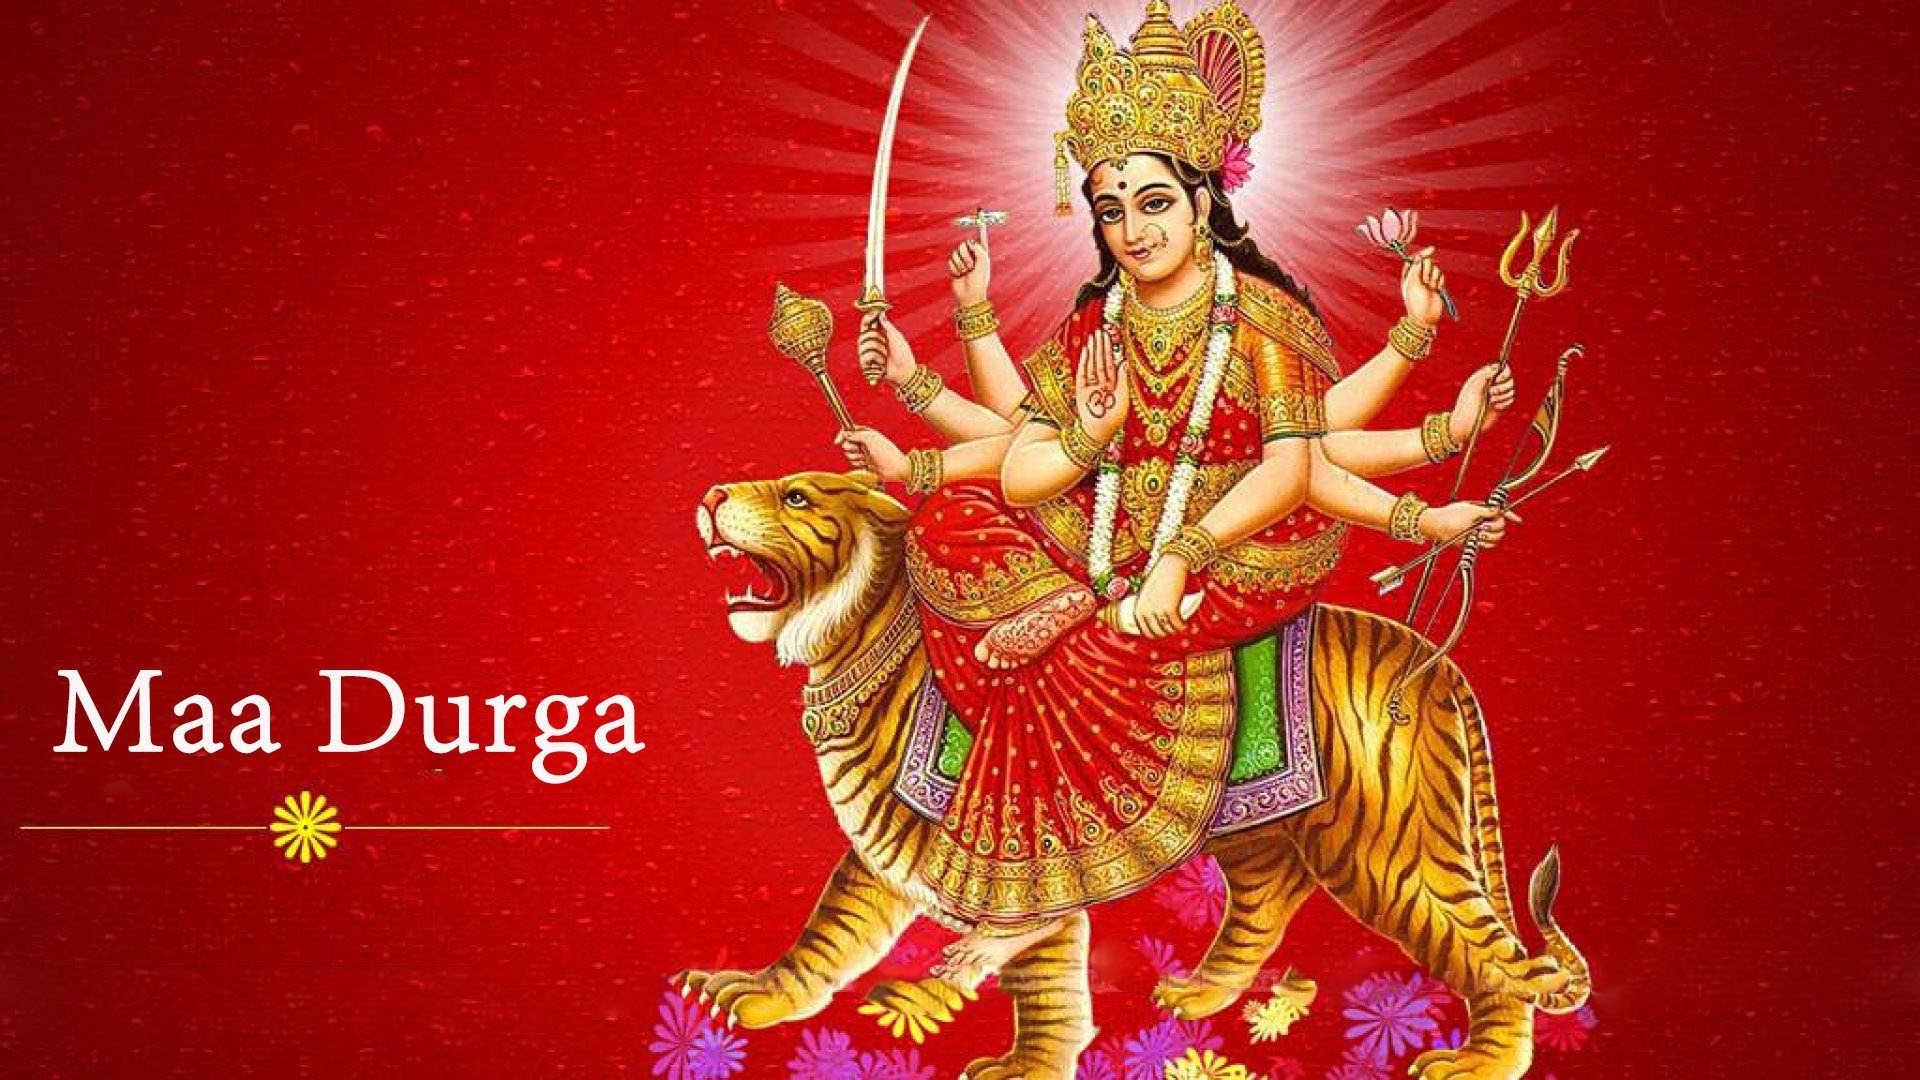 Maa Durga Photo Download